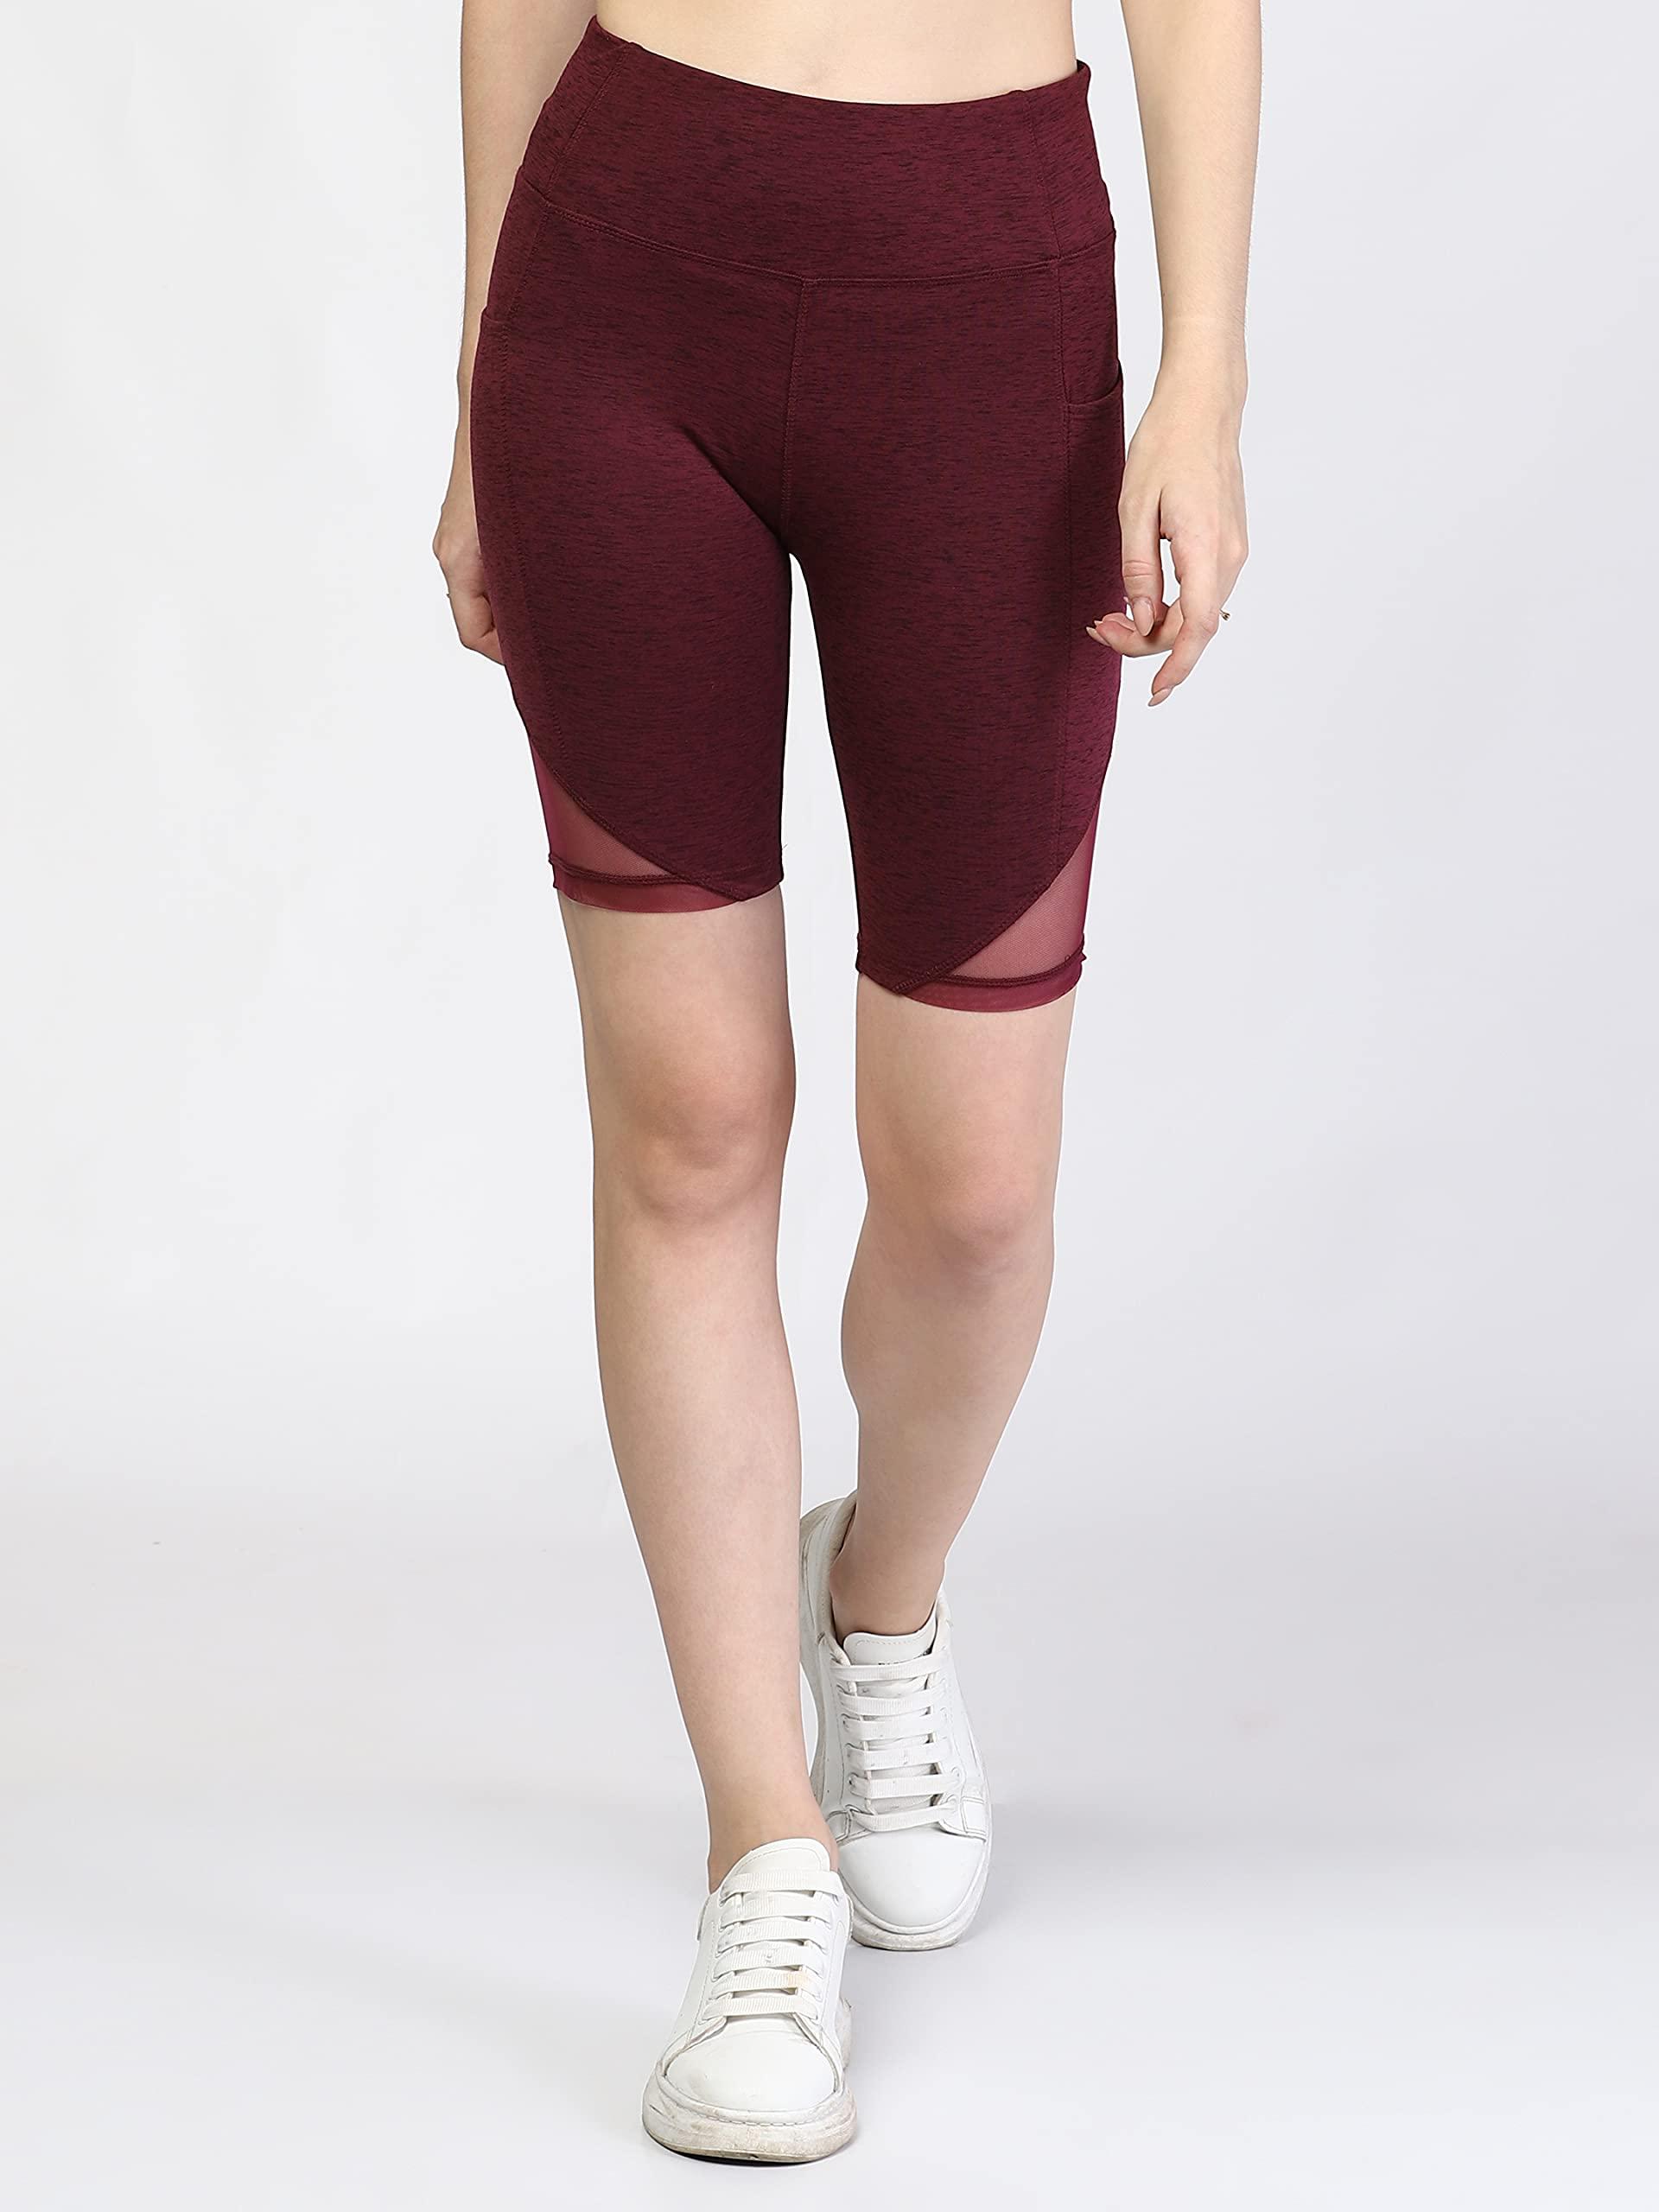 The Dance Bible Women High Waist Stylish Cycling Shorts with Pocket